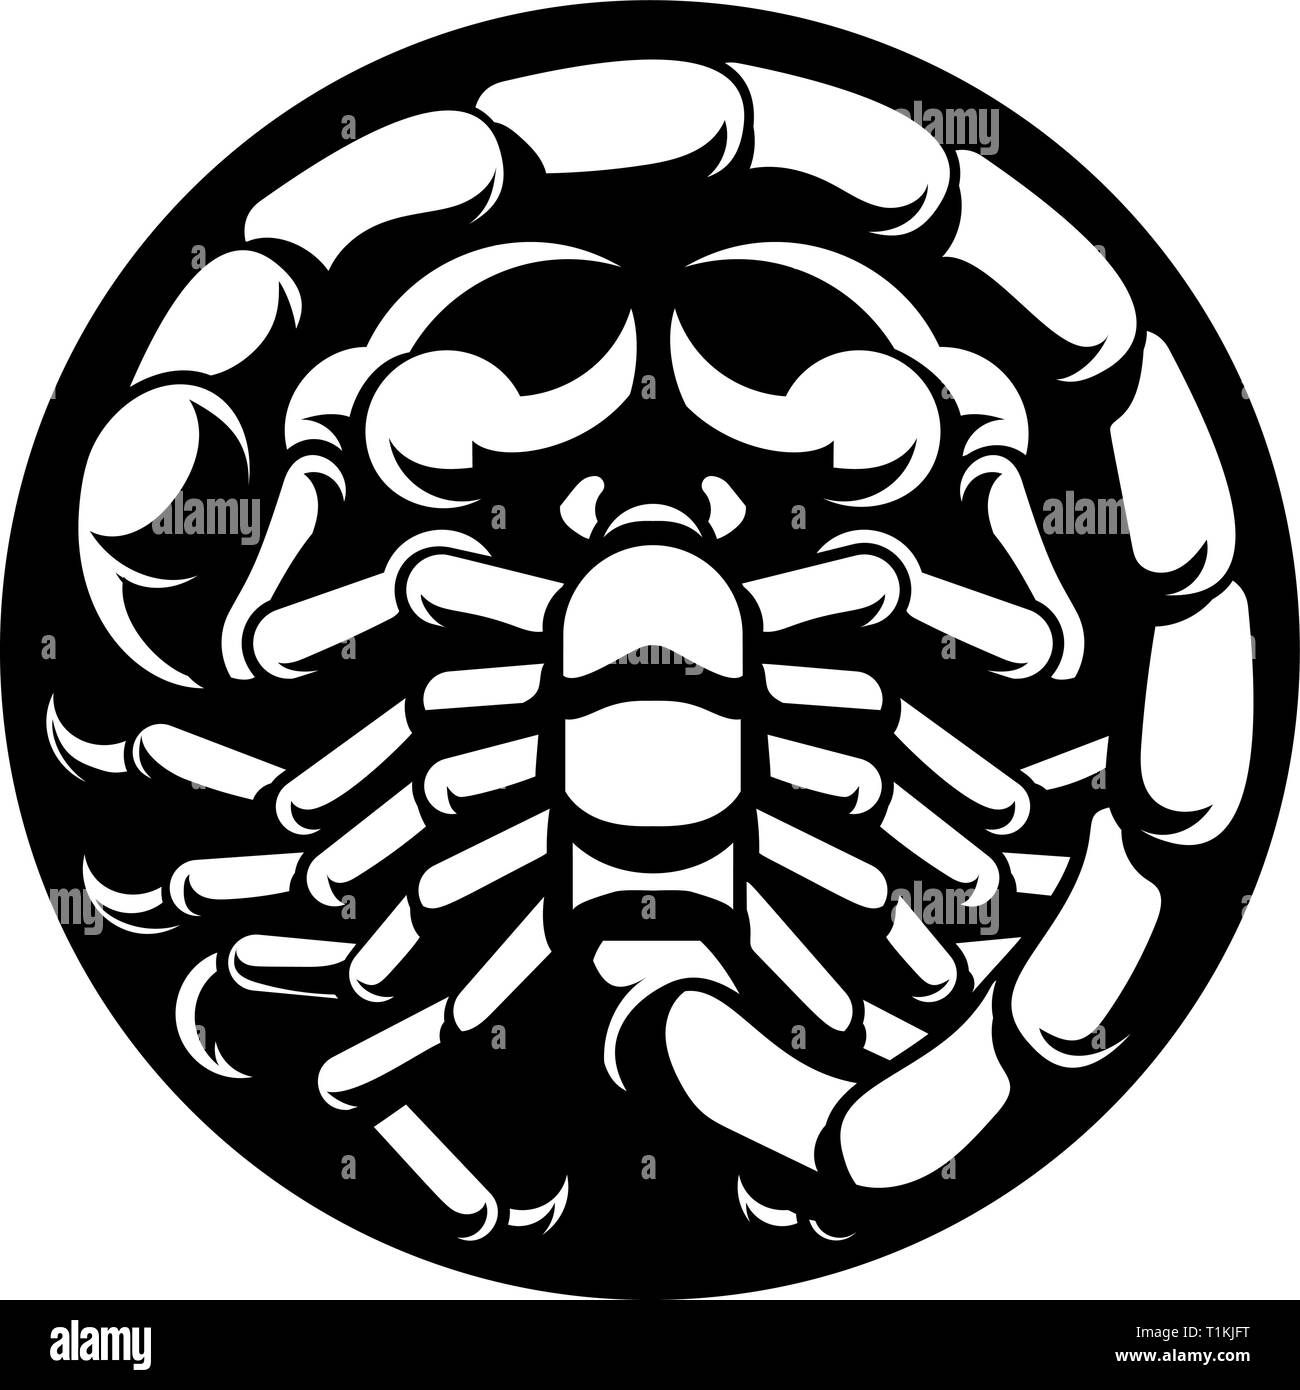 Zodiac Signs Scorpio Scorpion - Stock Image